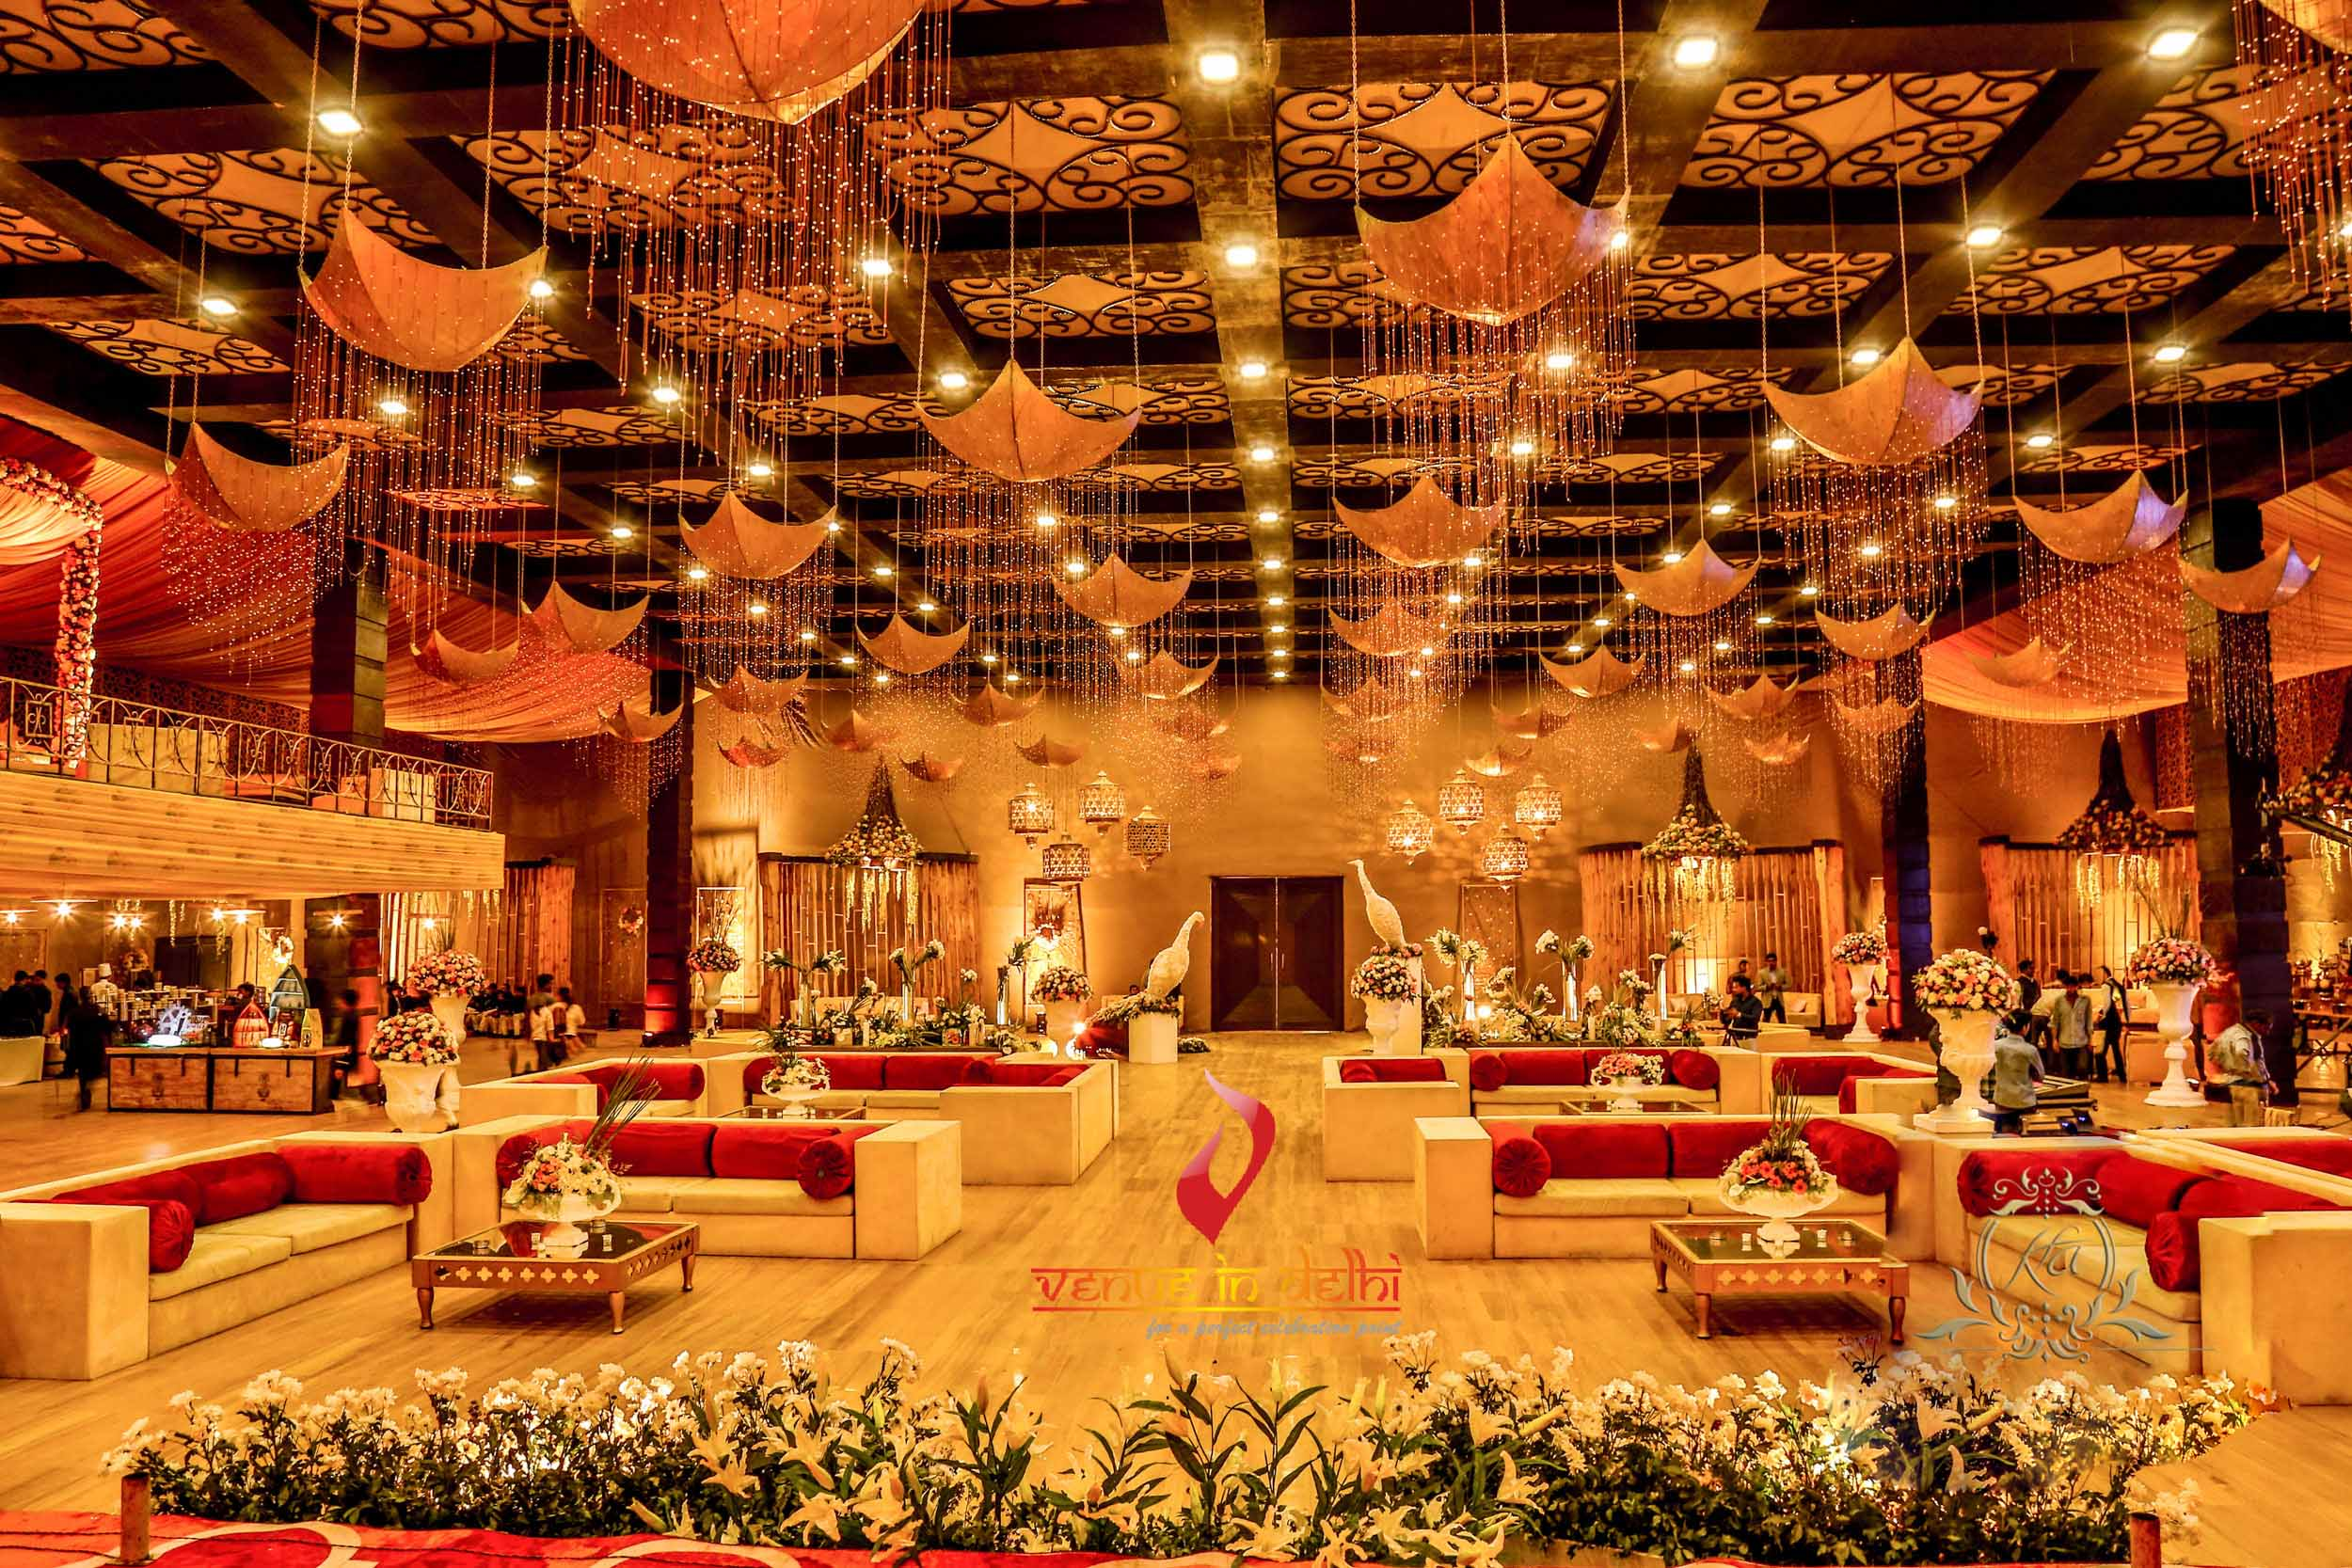 Vilasa By Ferns N Petals Kapashera Banquet Hall In South Delhi